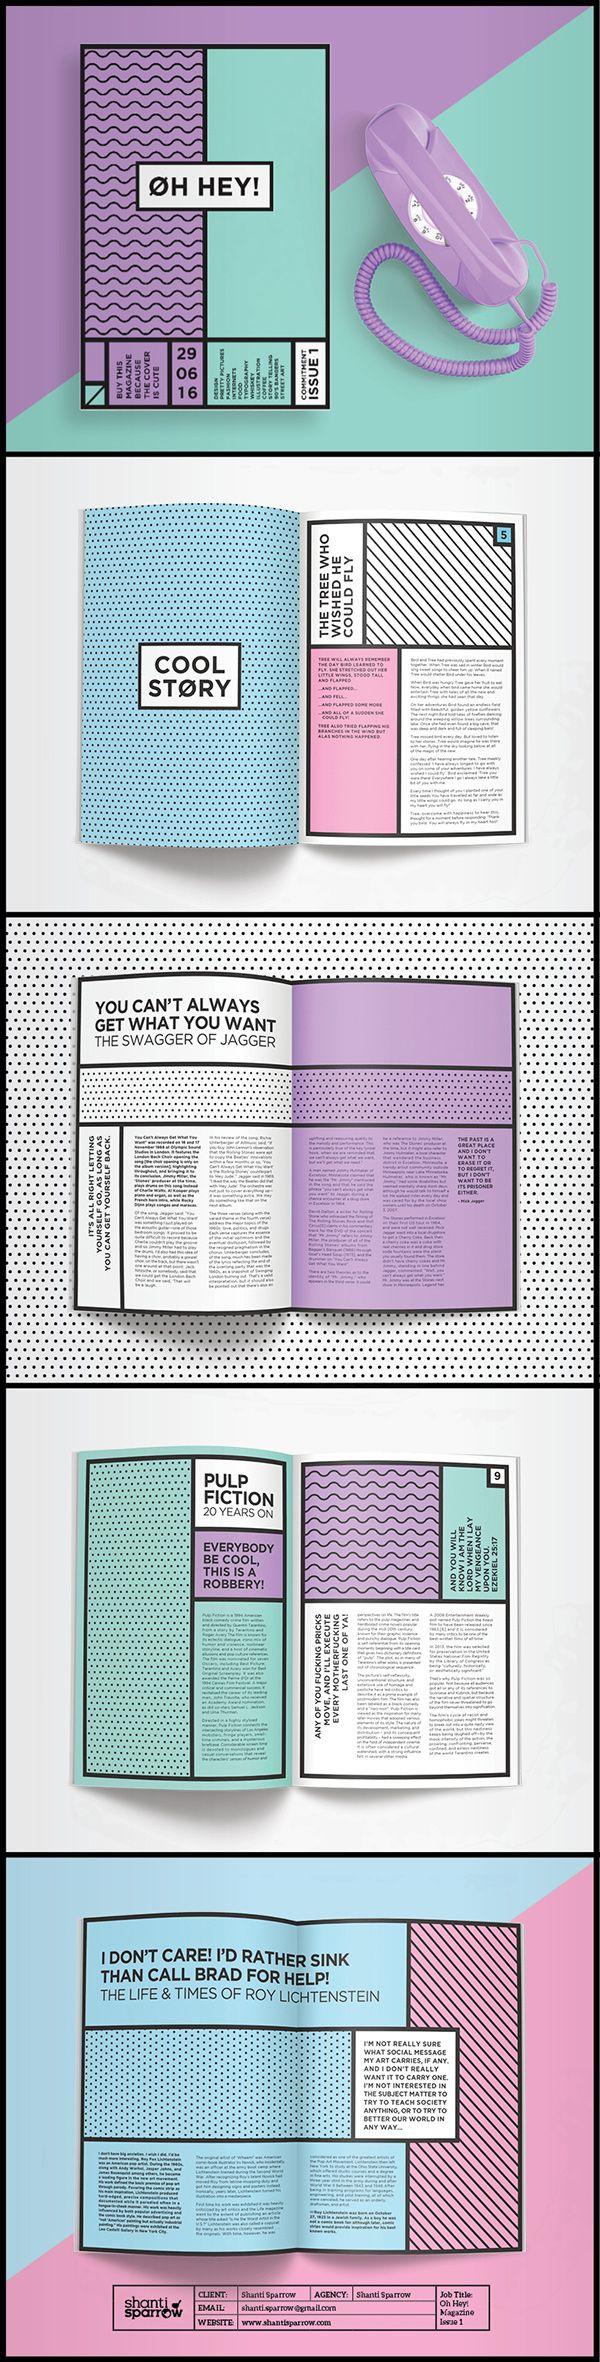 Oh Hey! Magazine on Behance | Magazine design, Pop art decor